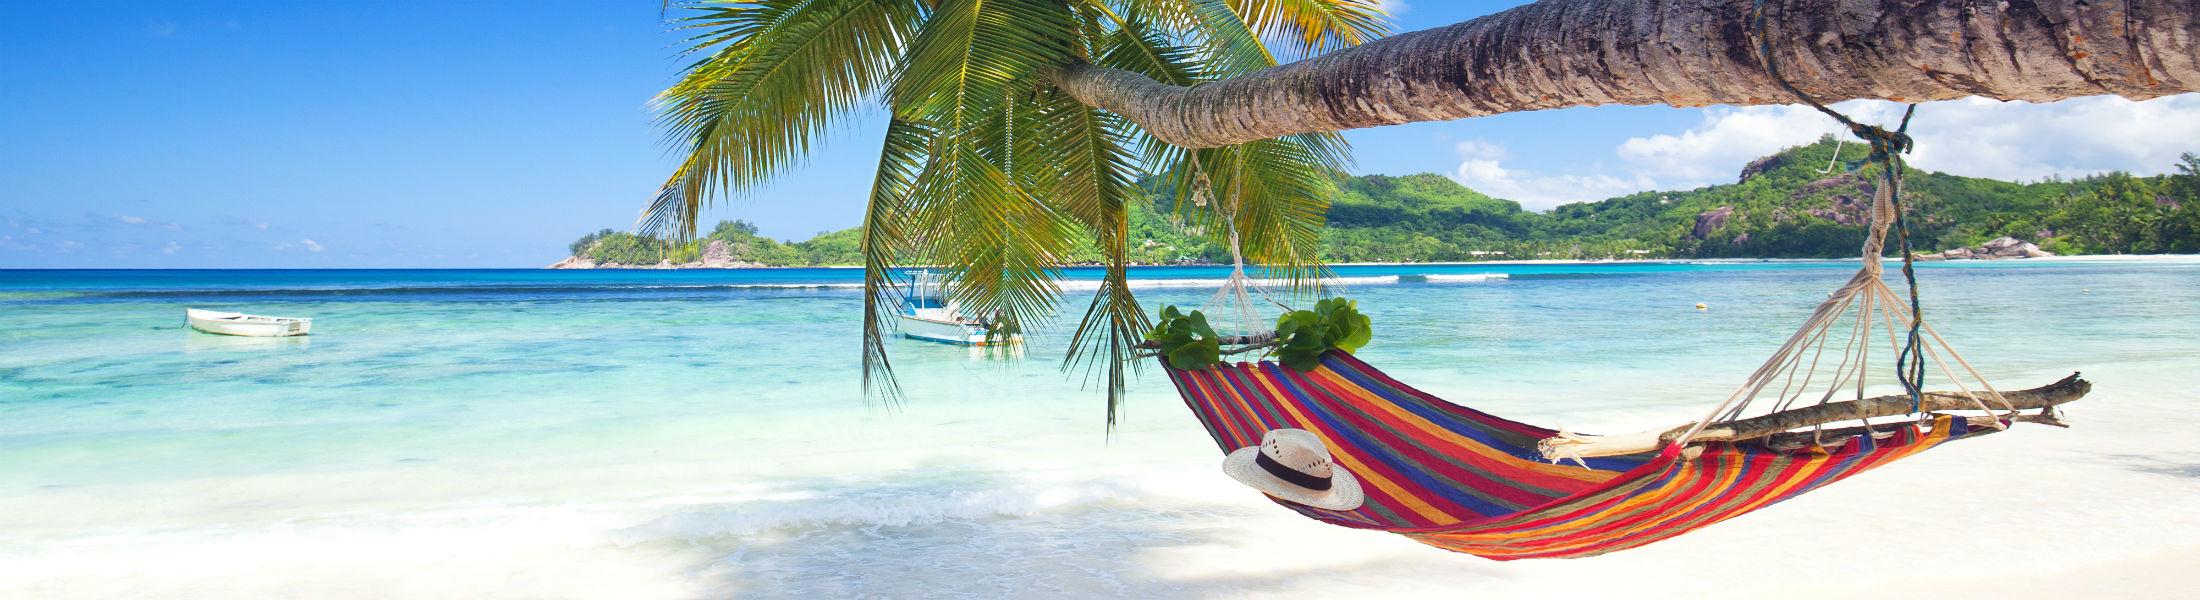 paradise beach of seychelles island